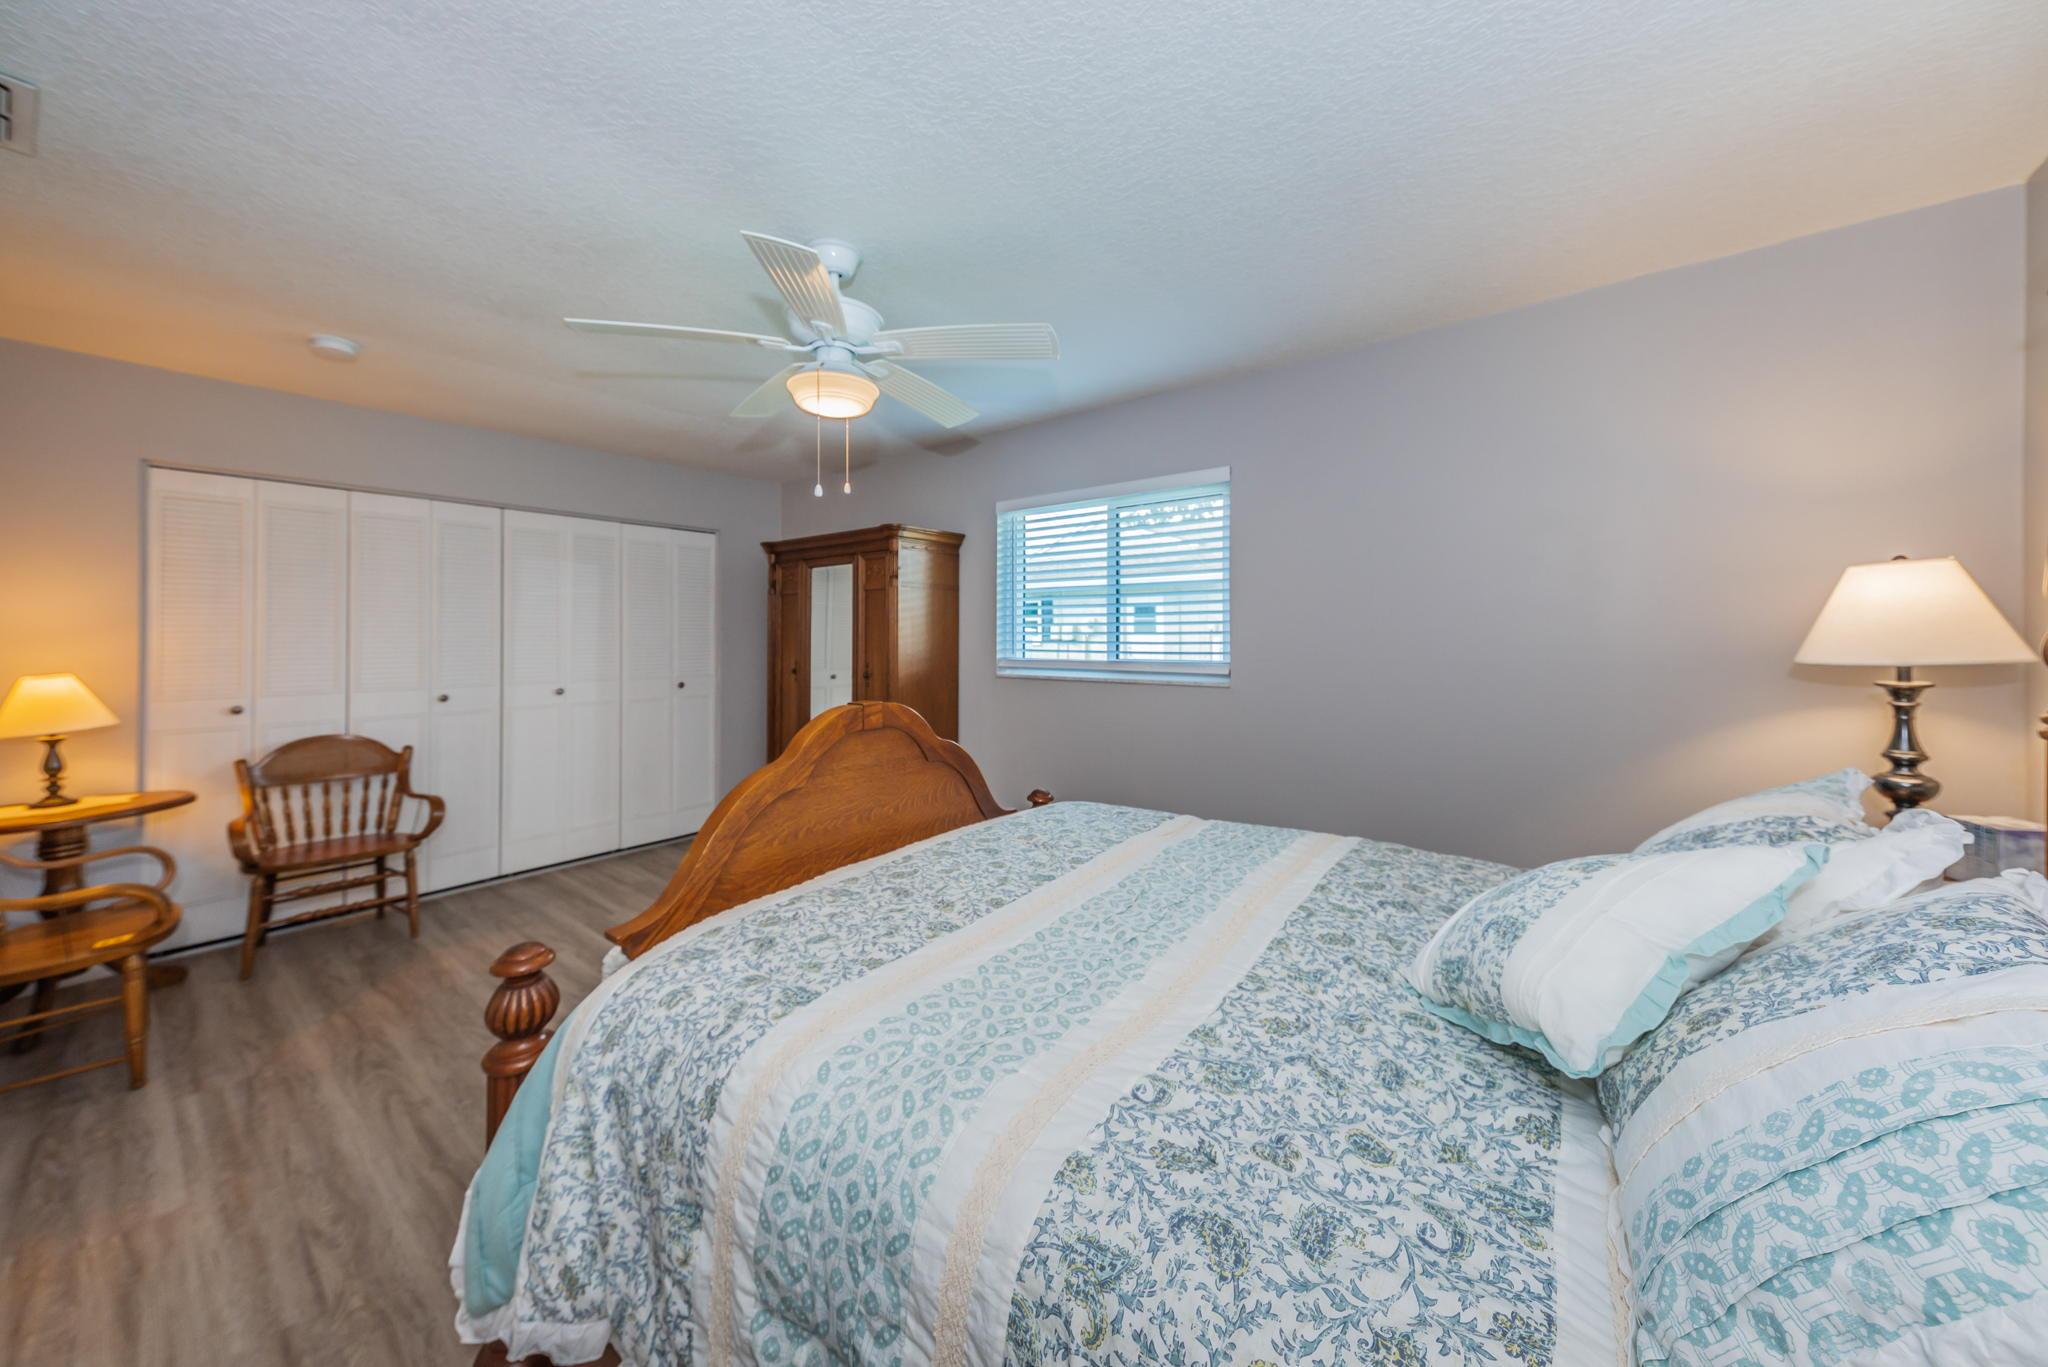 Bedroom3b